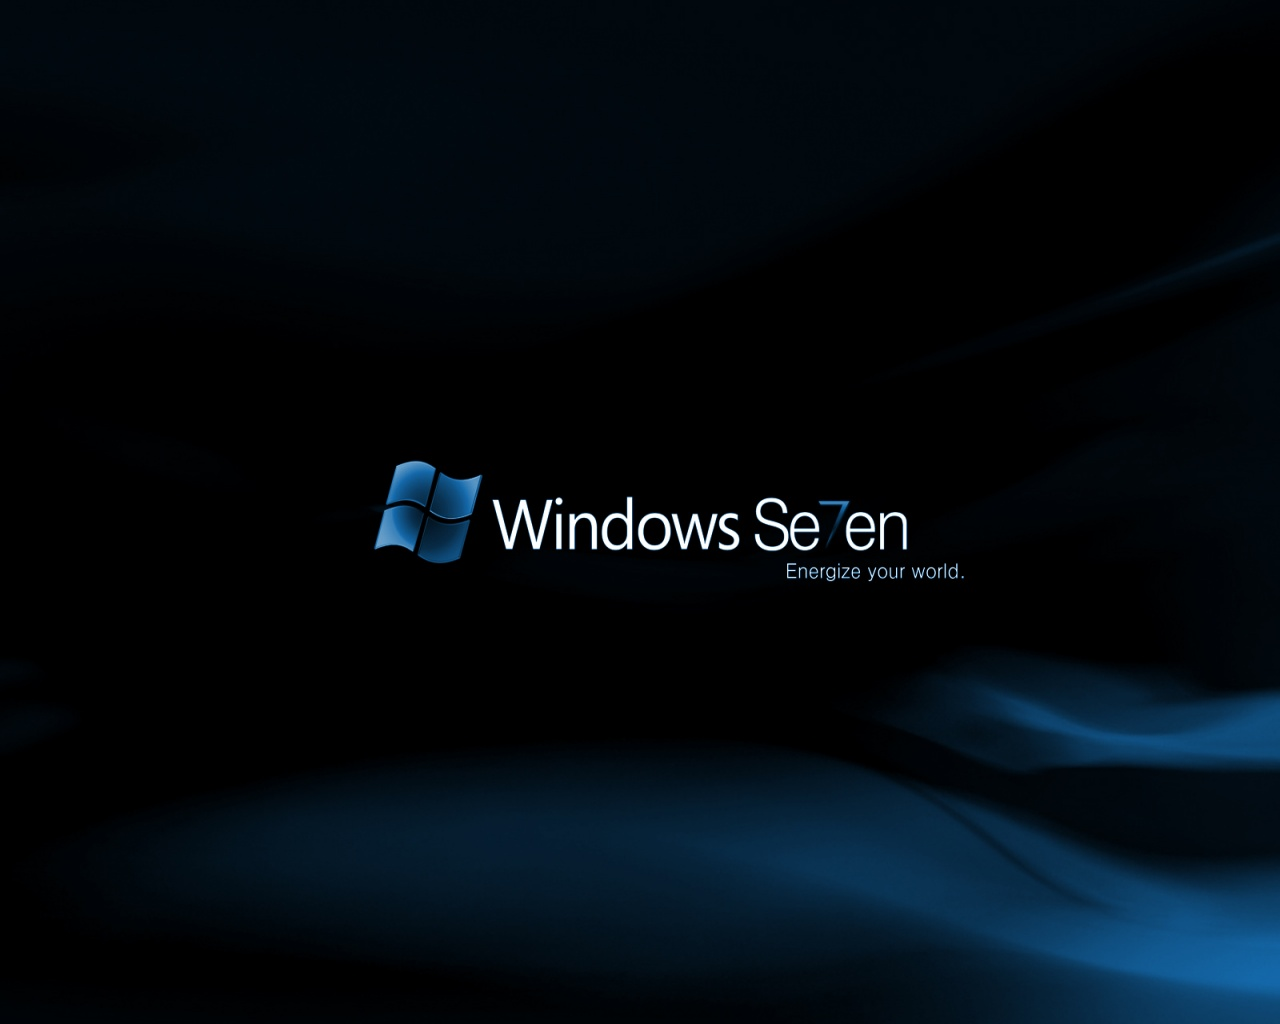 1280x1024 Blue Windows 7 desktop PC and Mac wallpaper 1280x1024